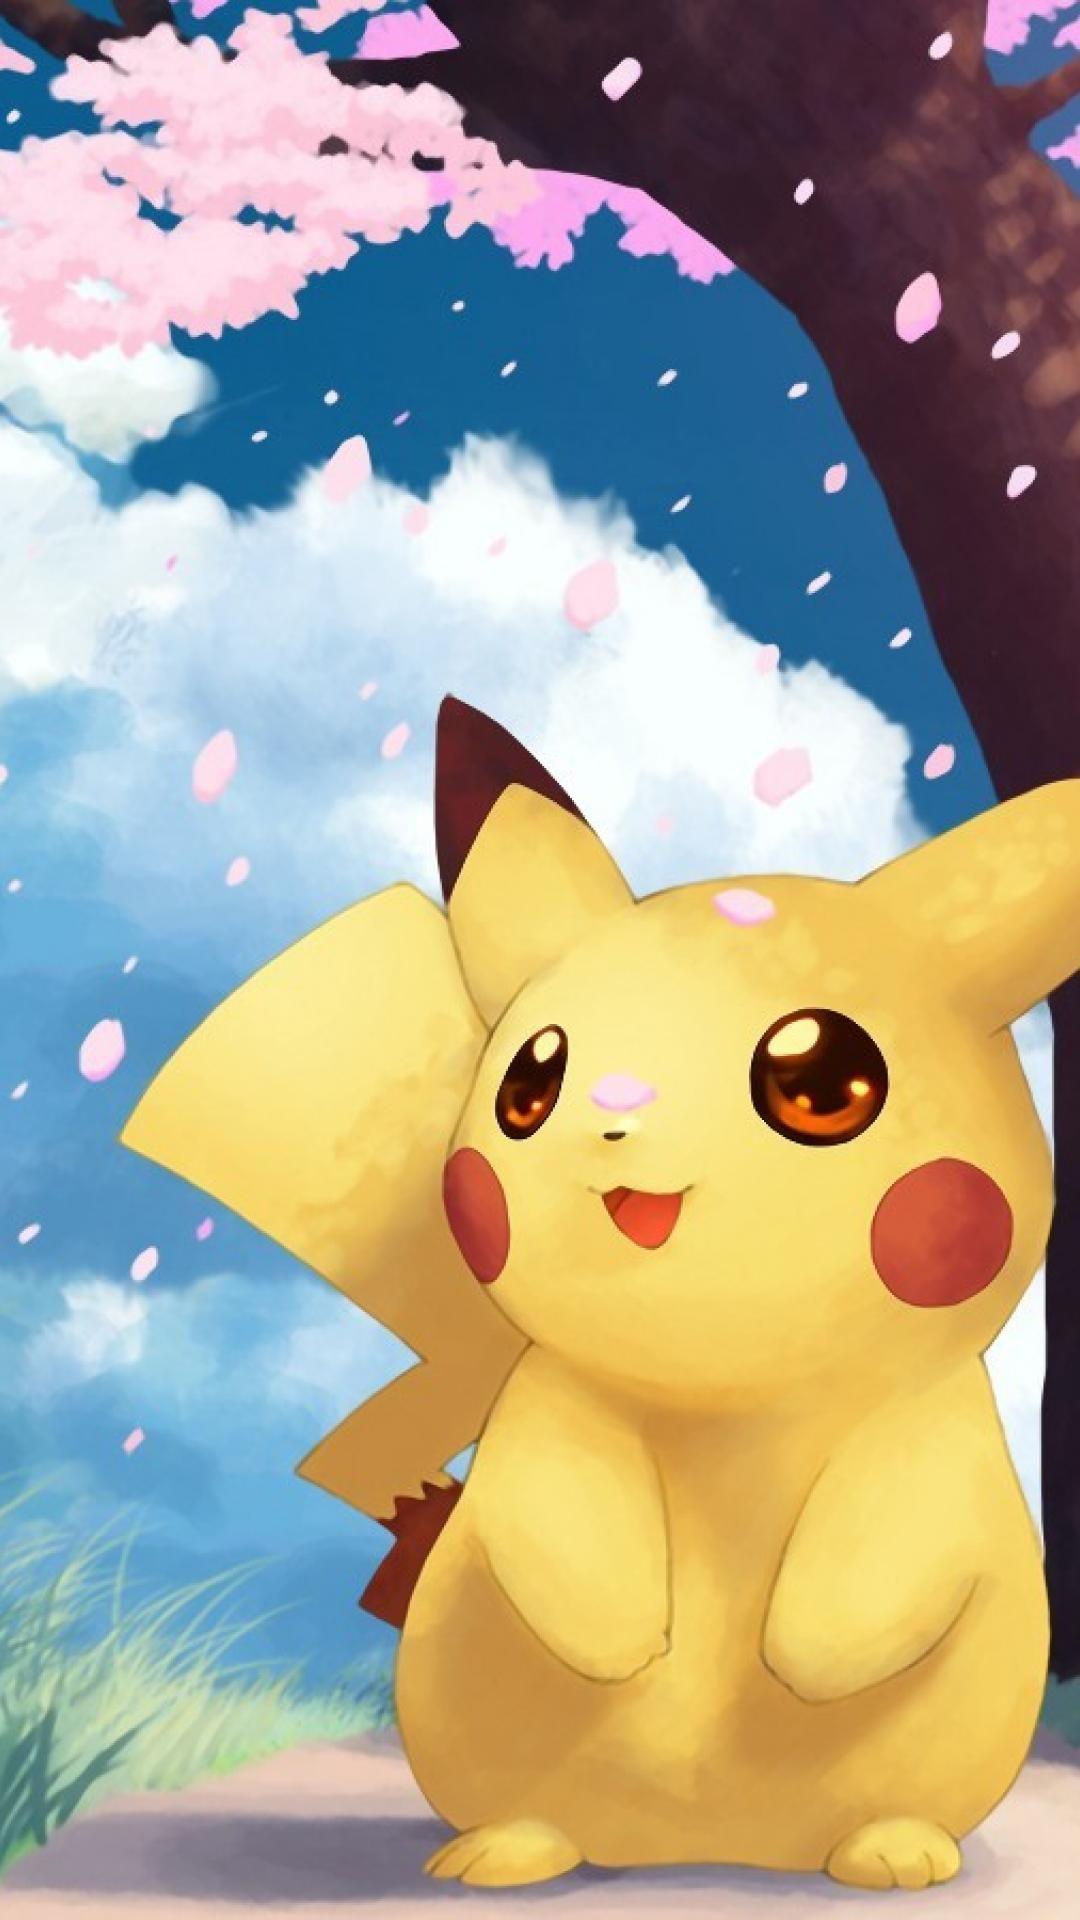 Kartun Pokemon Pikachu Gambar Pokemon Lucu Pokemon